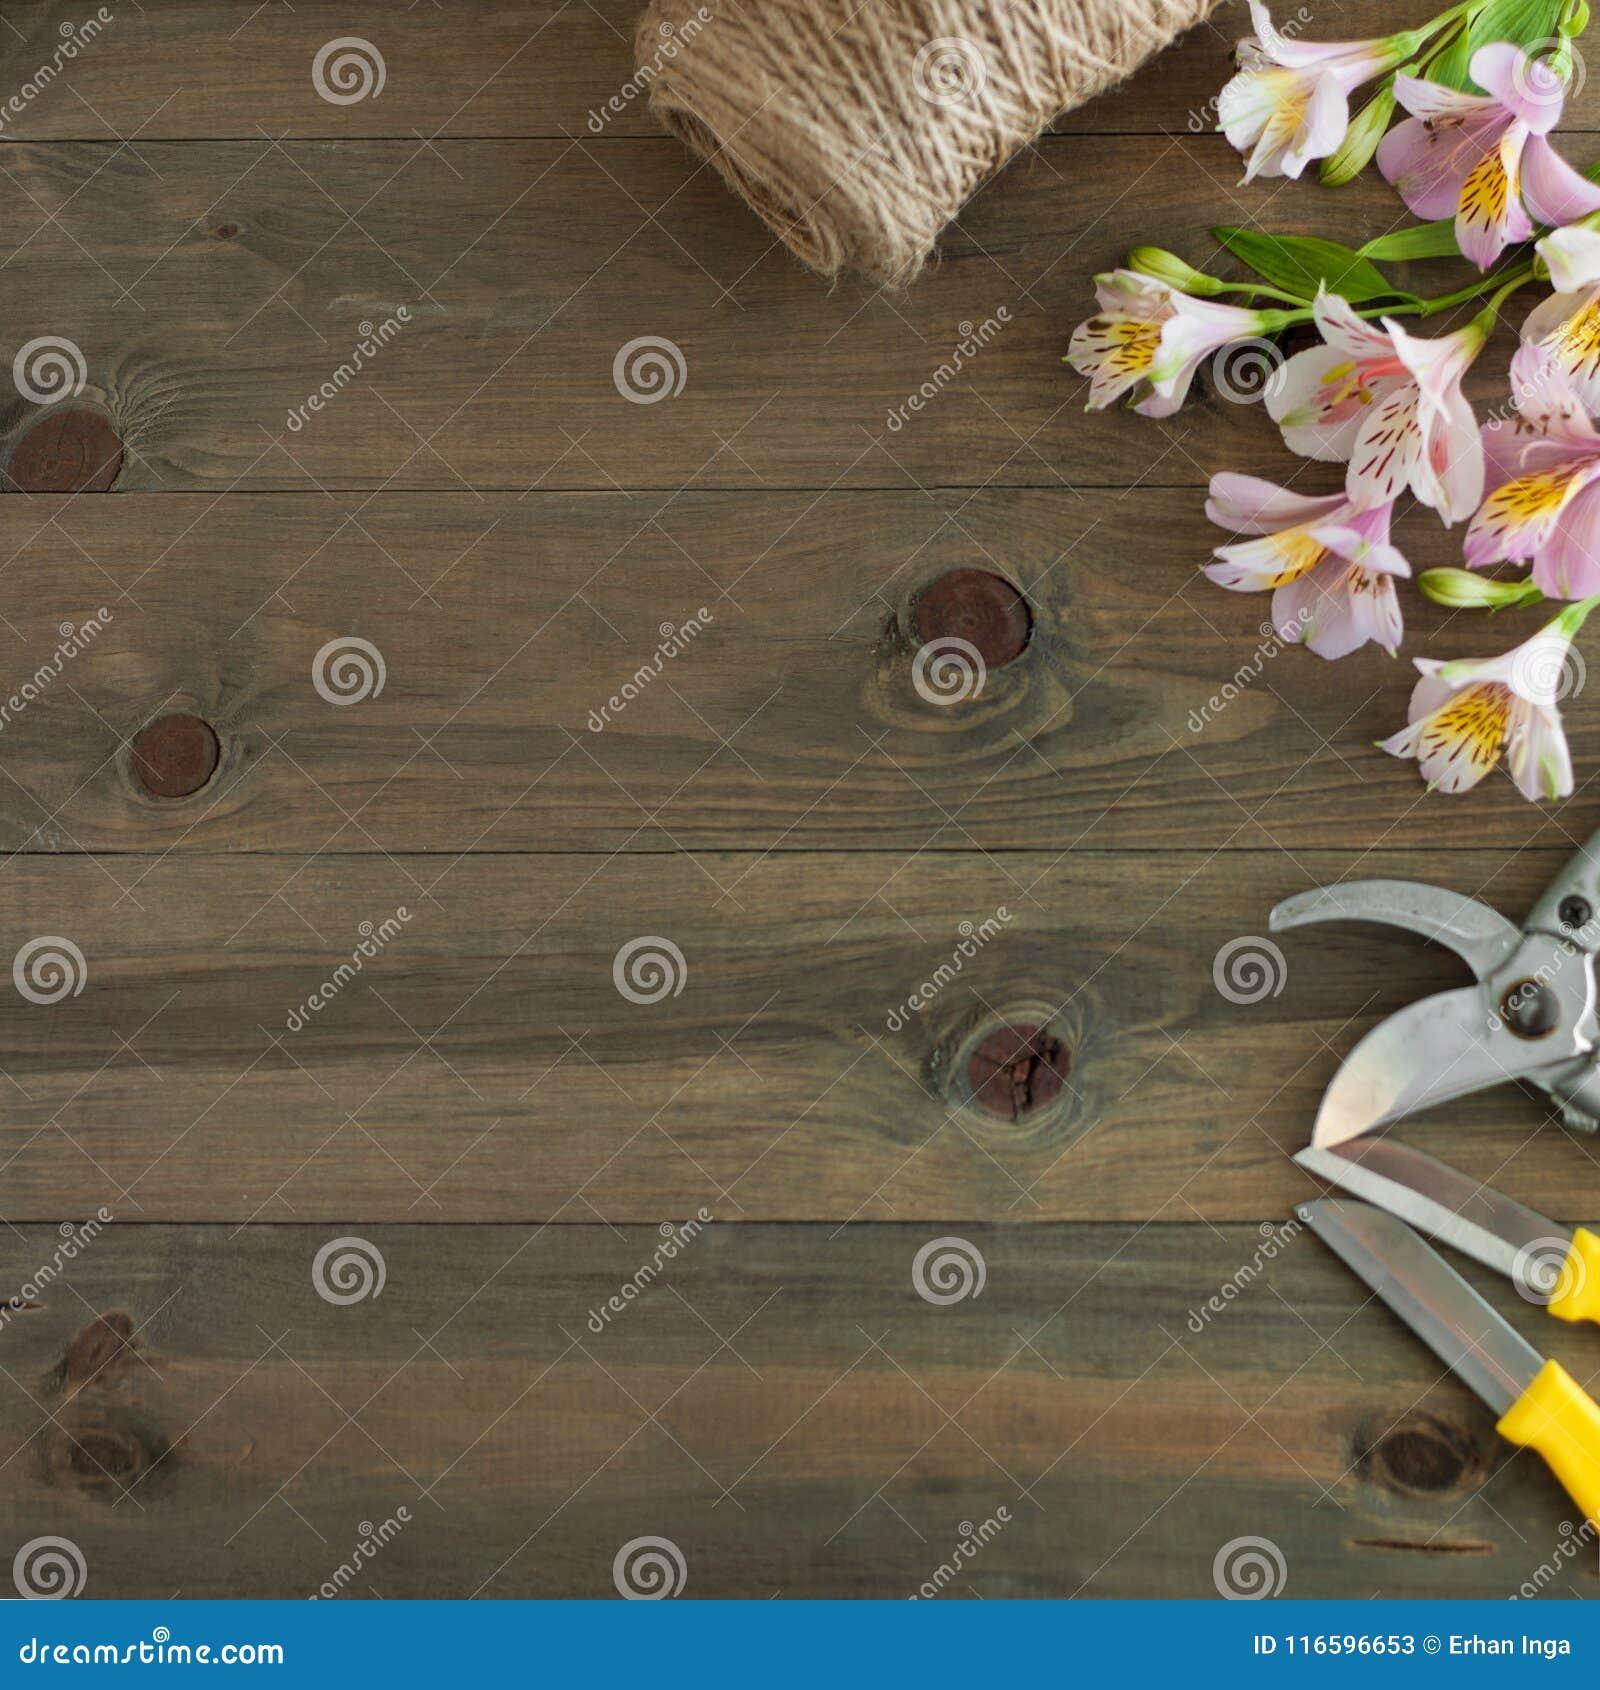 Pink Alstromeria Flowers On Wooden Background With Garden Floristic ...